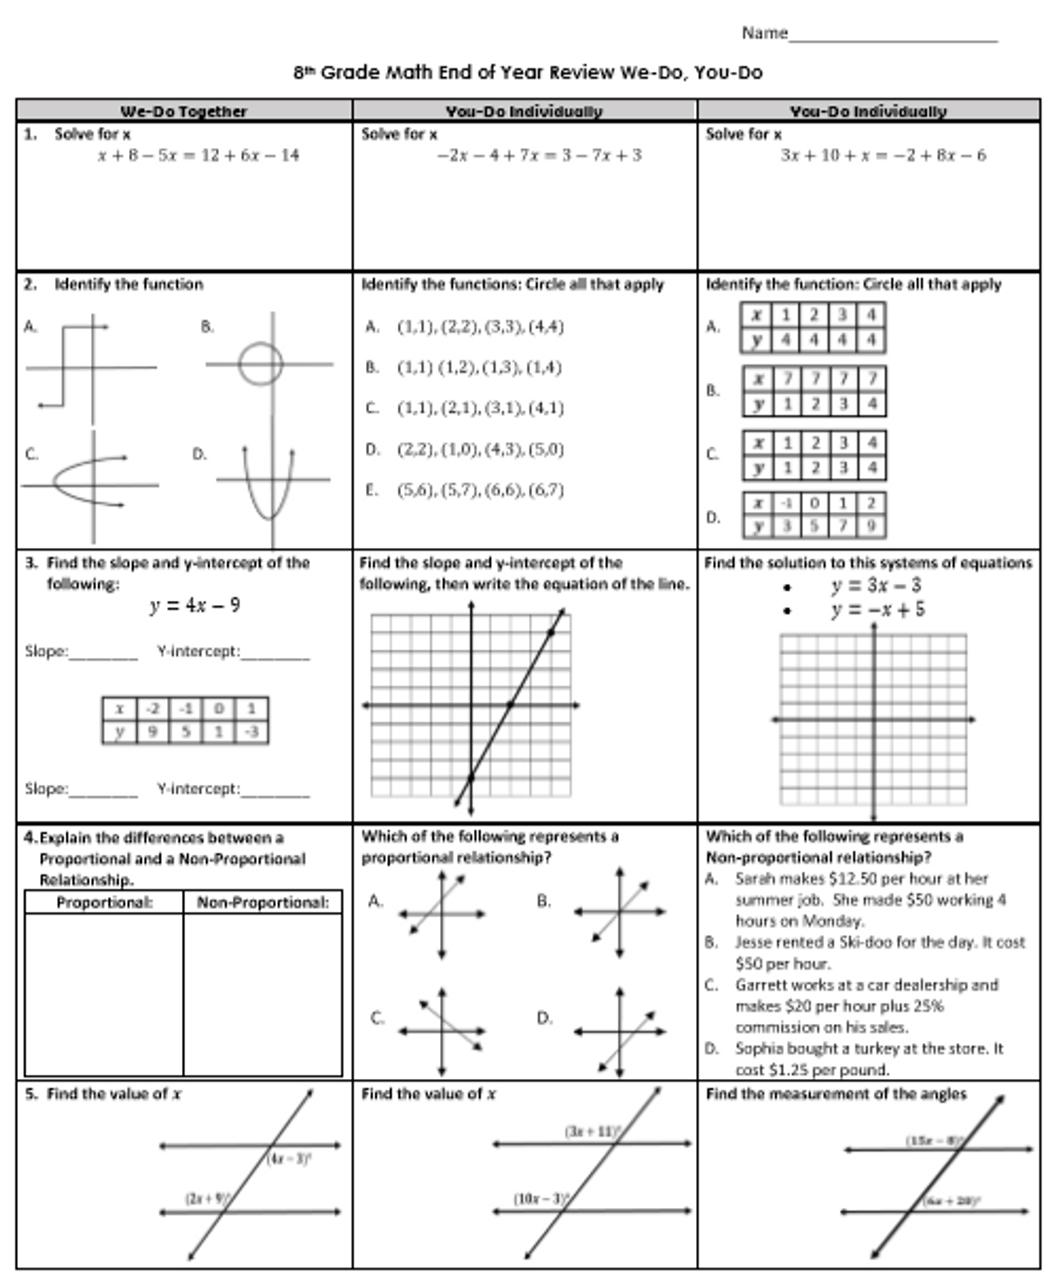 medium resolution of 8th Grade Math STAAR Review You Do